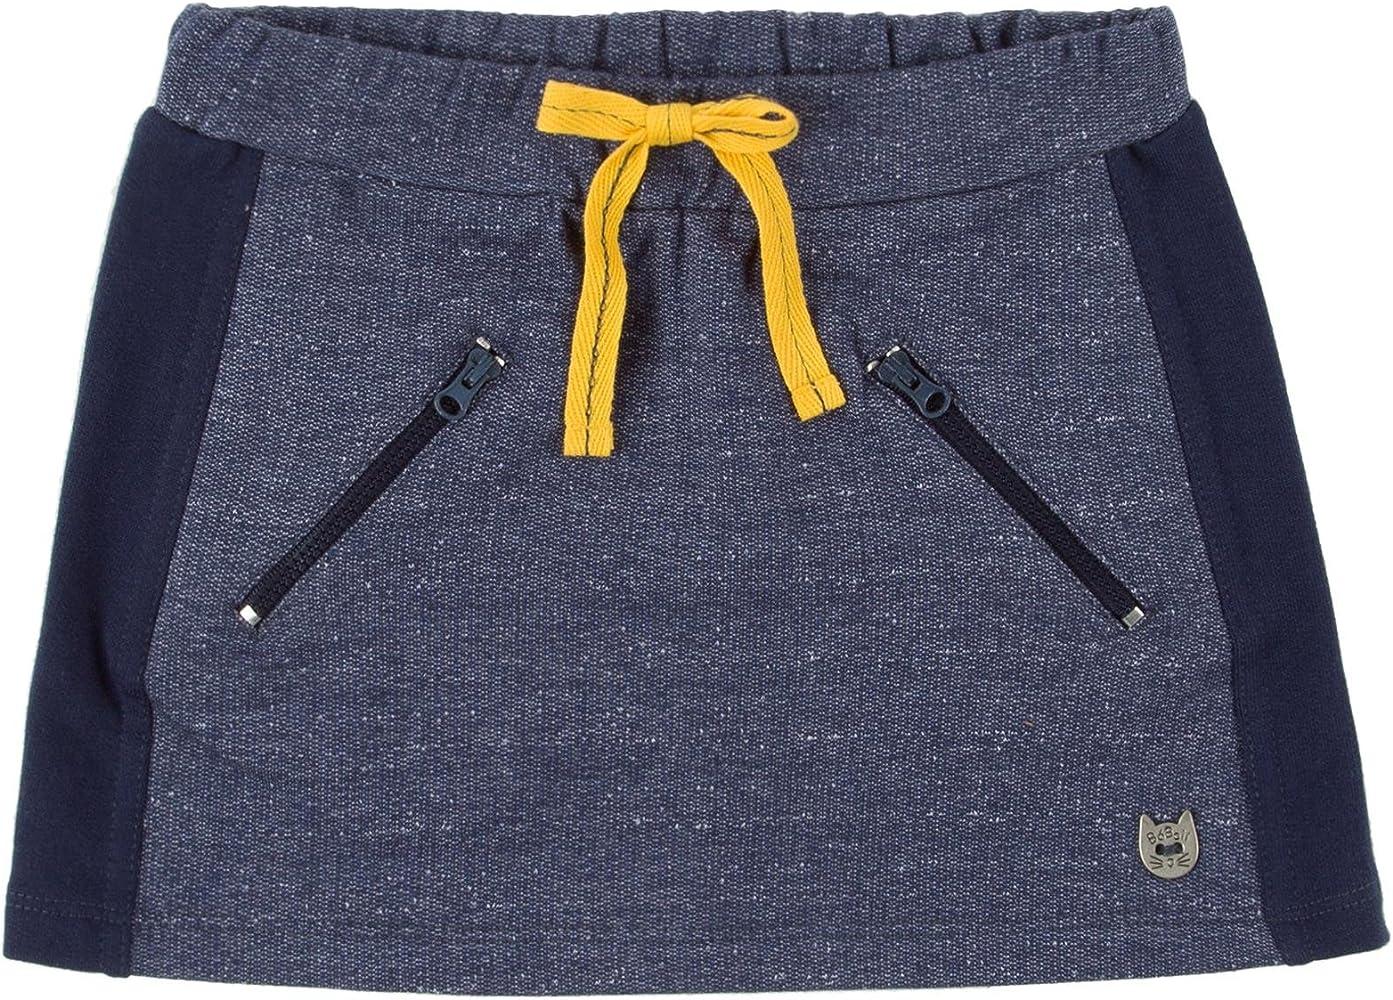 boboli Fleece Skirt FOR Girl Faldas Deportivas, Azul (Navy 2440 ...